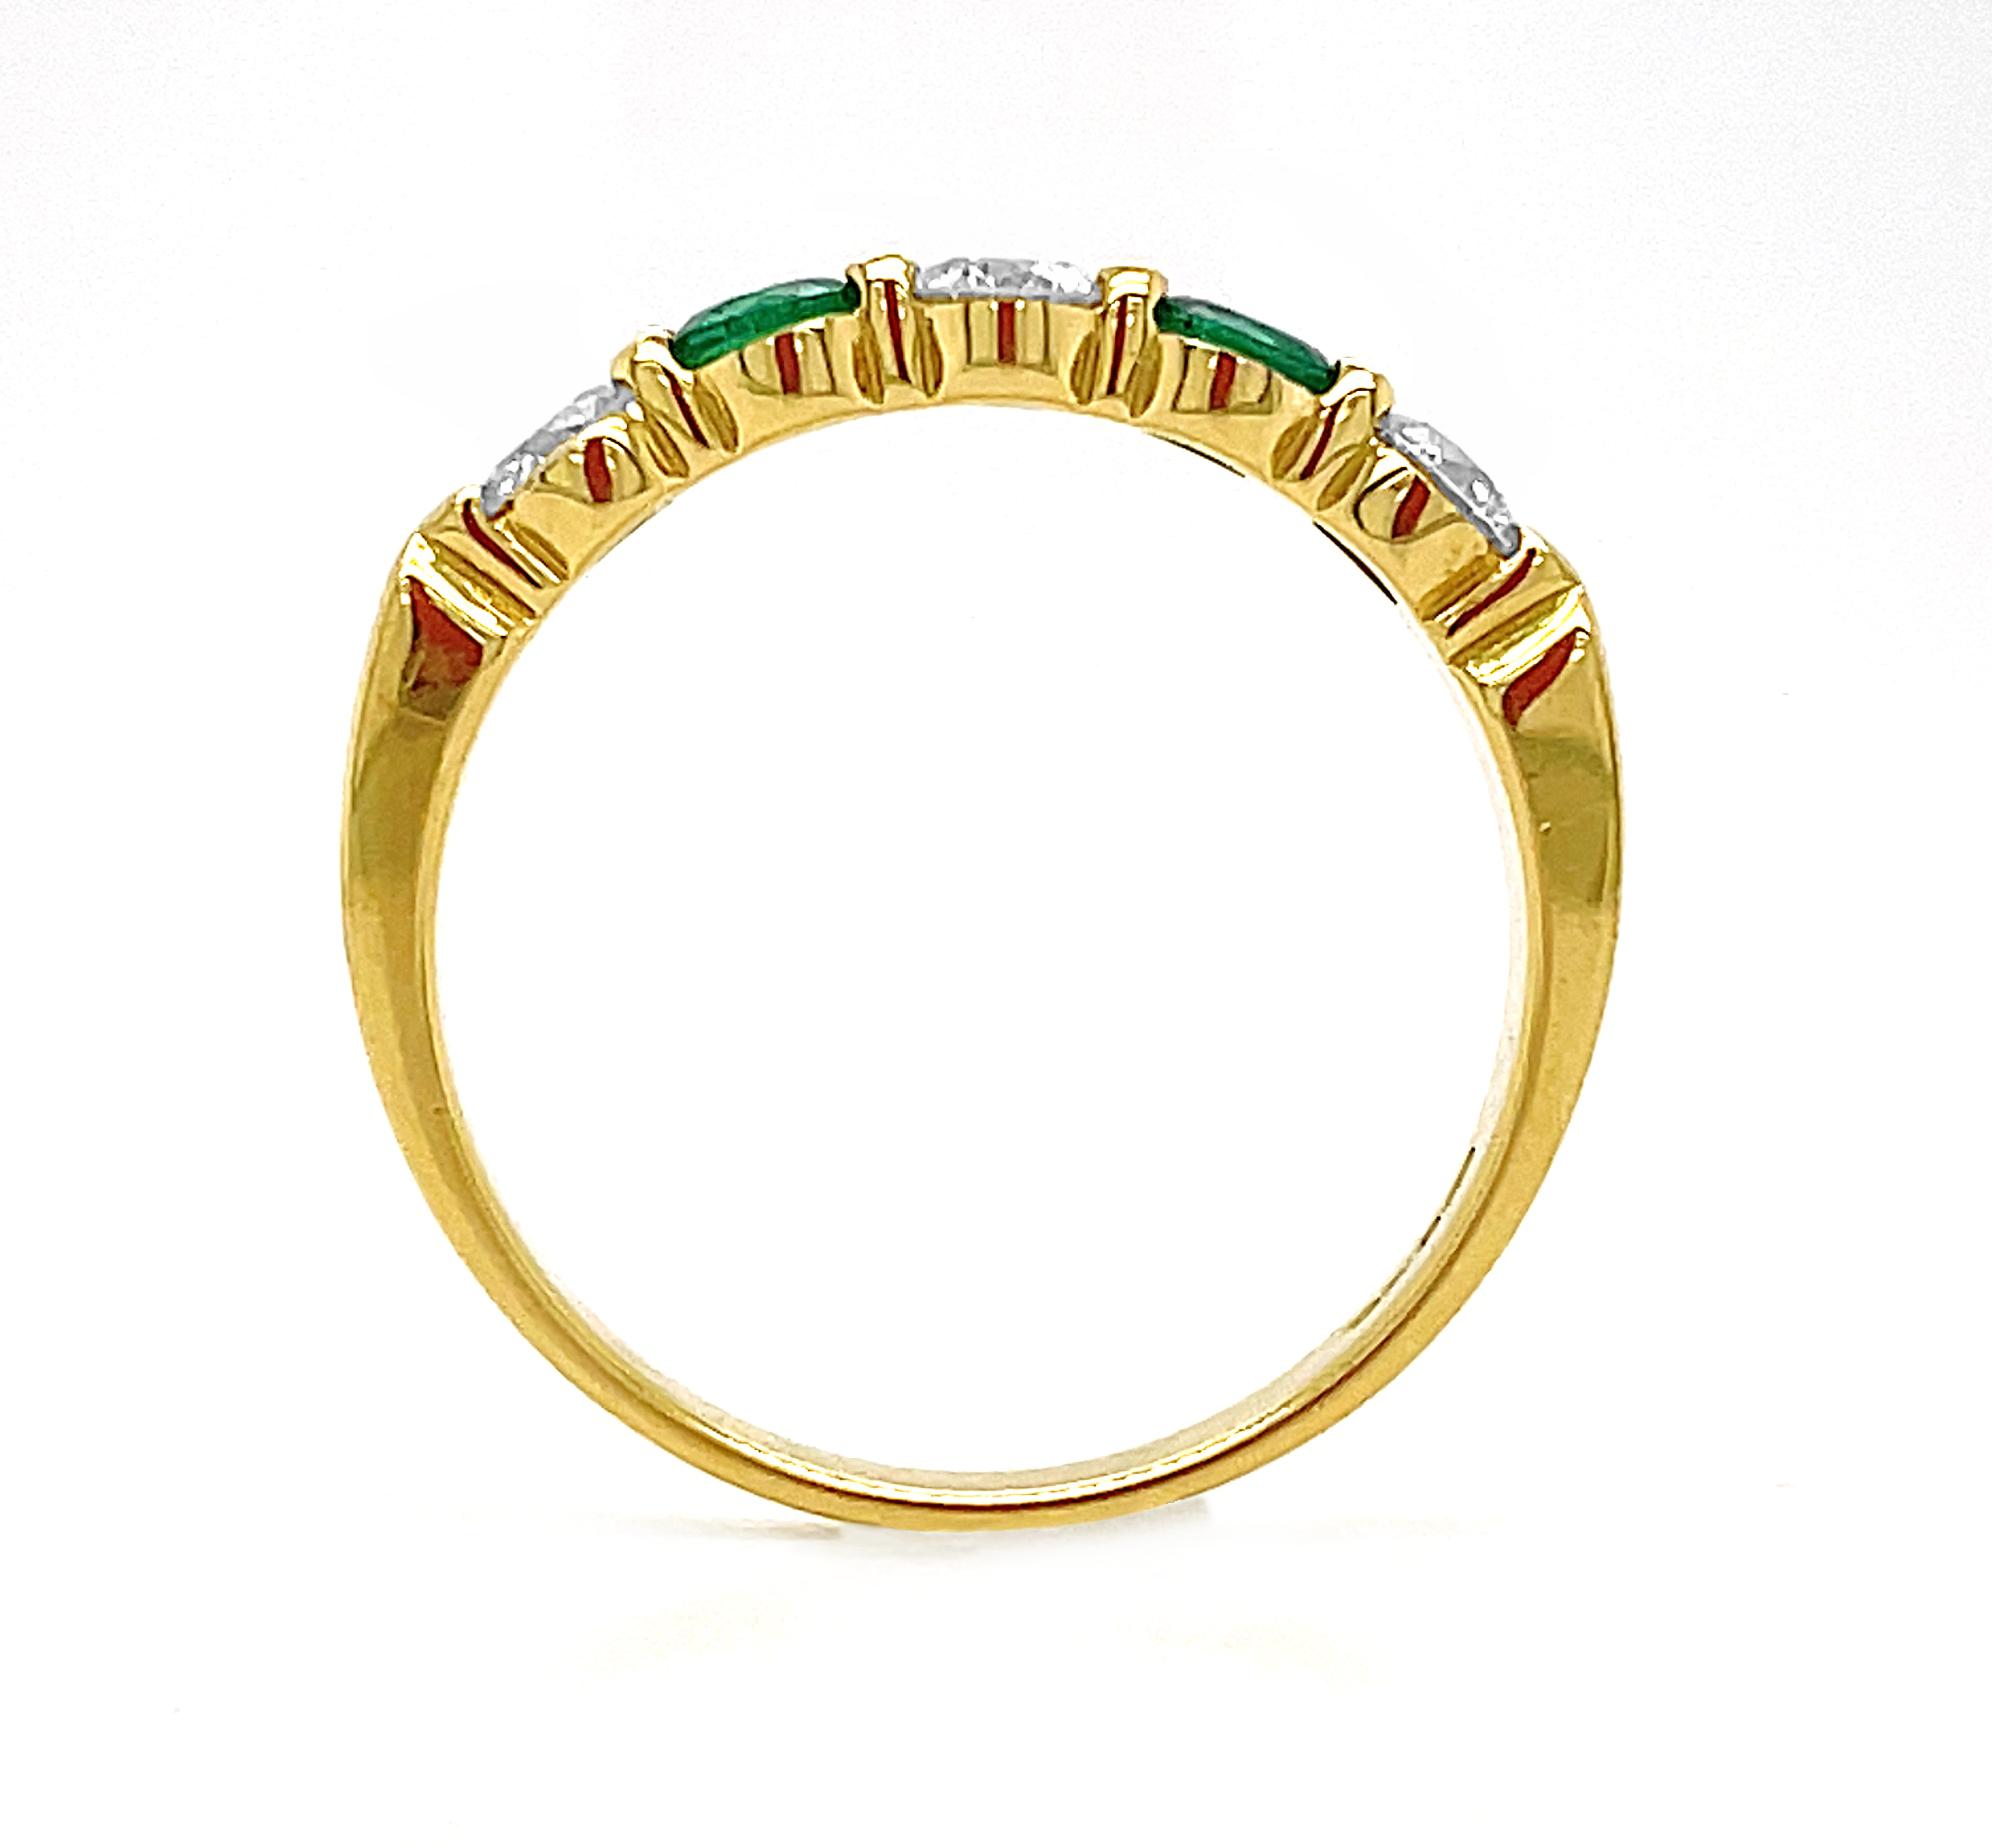 18k Yellow Gold 5 Stone Round Emerald & Brilliant Cut Diamond Ring